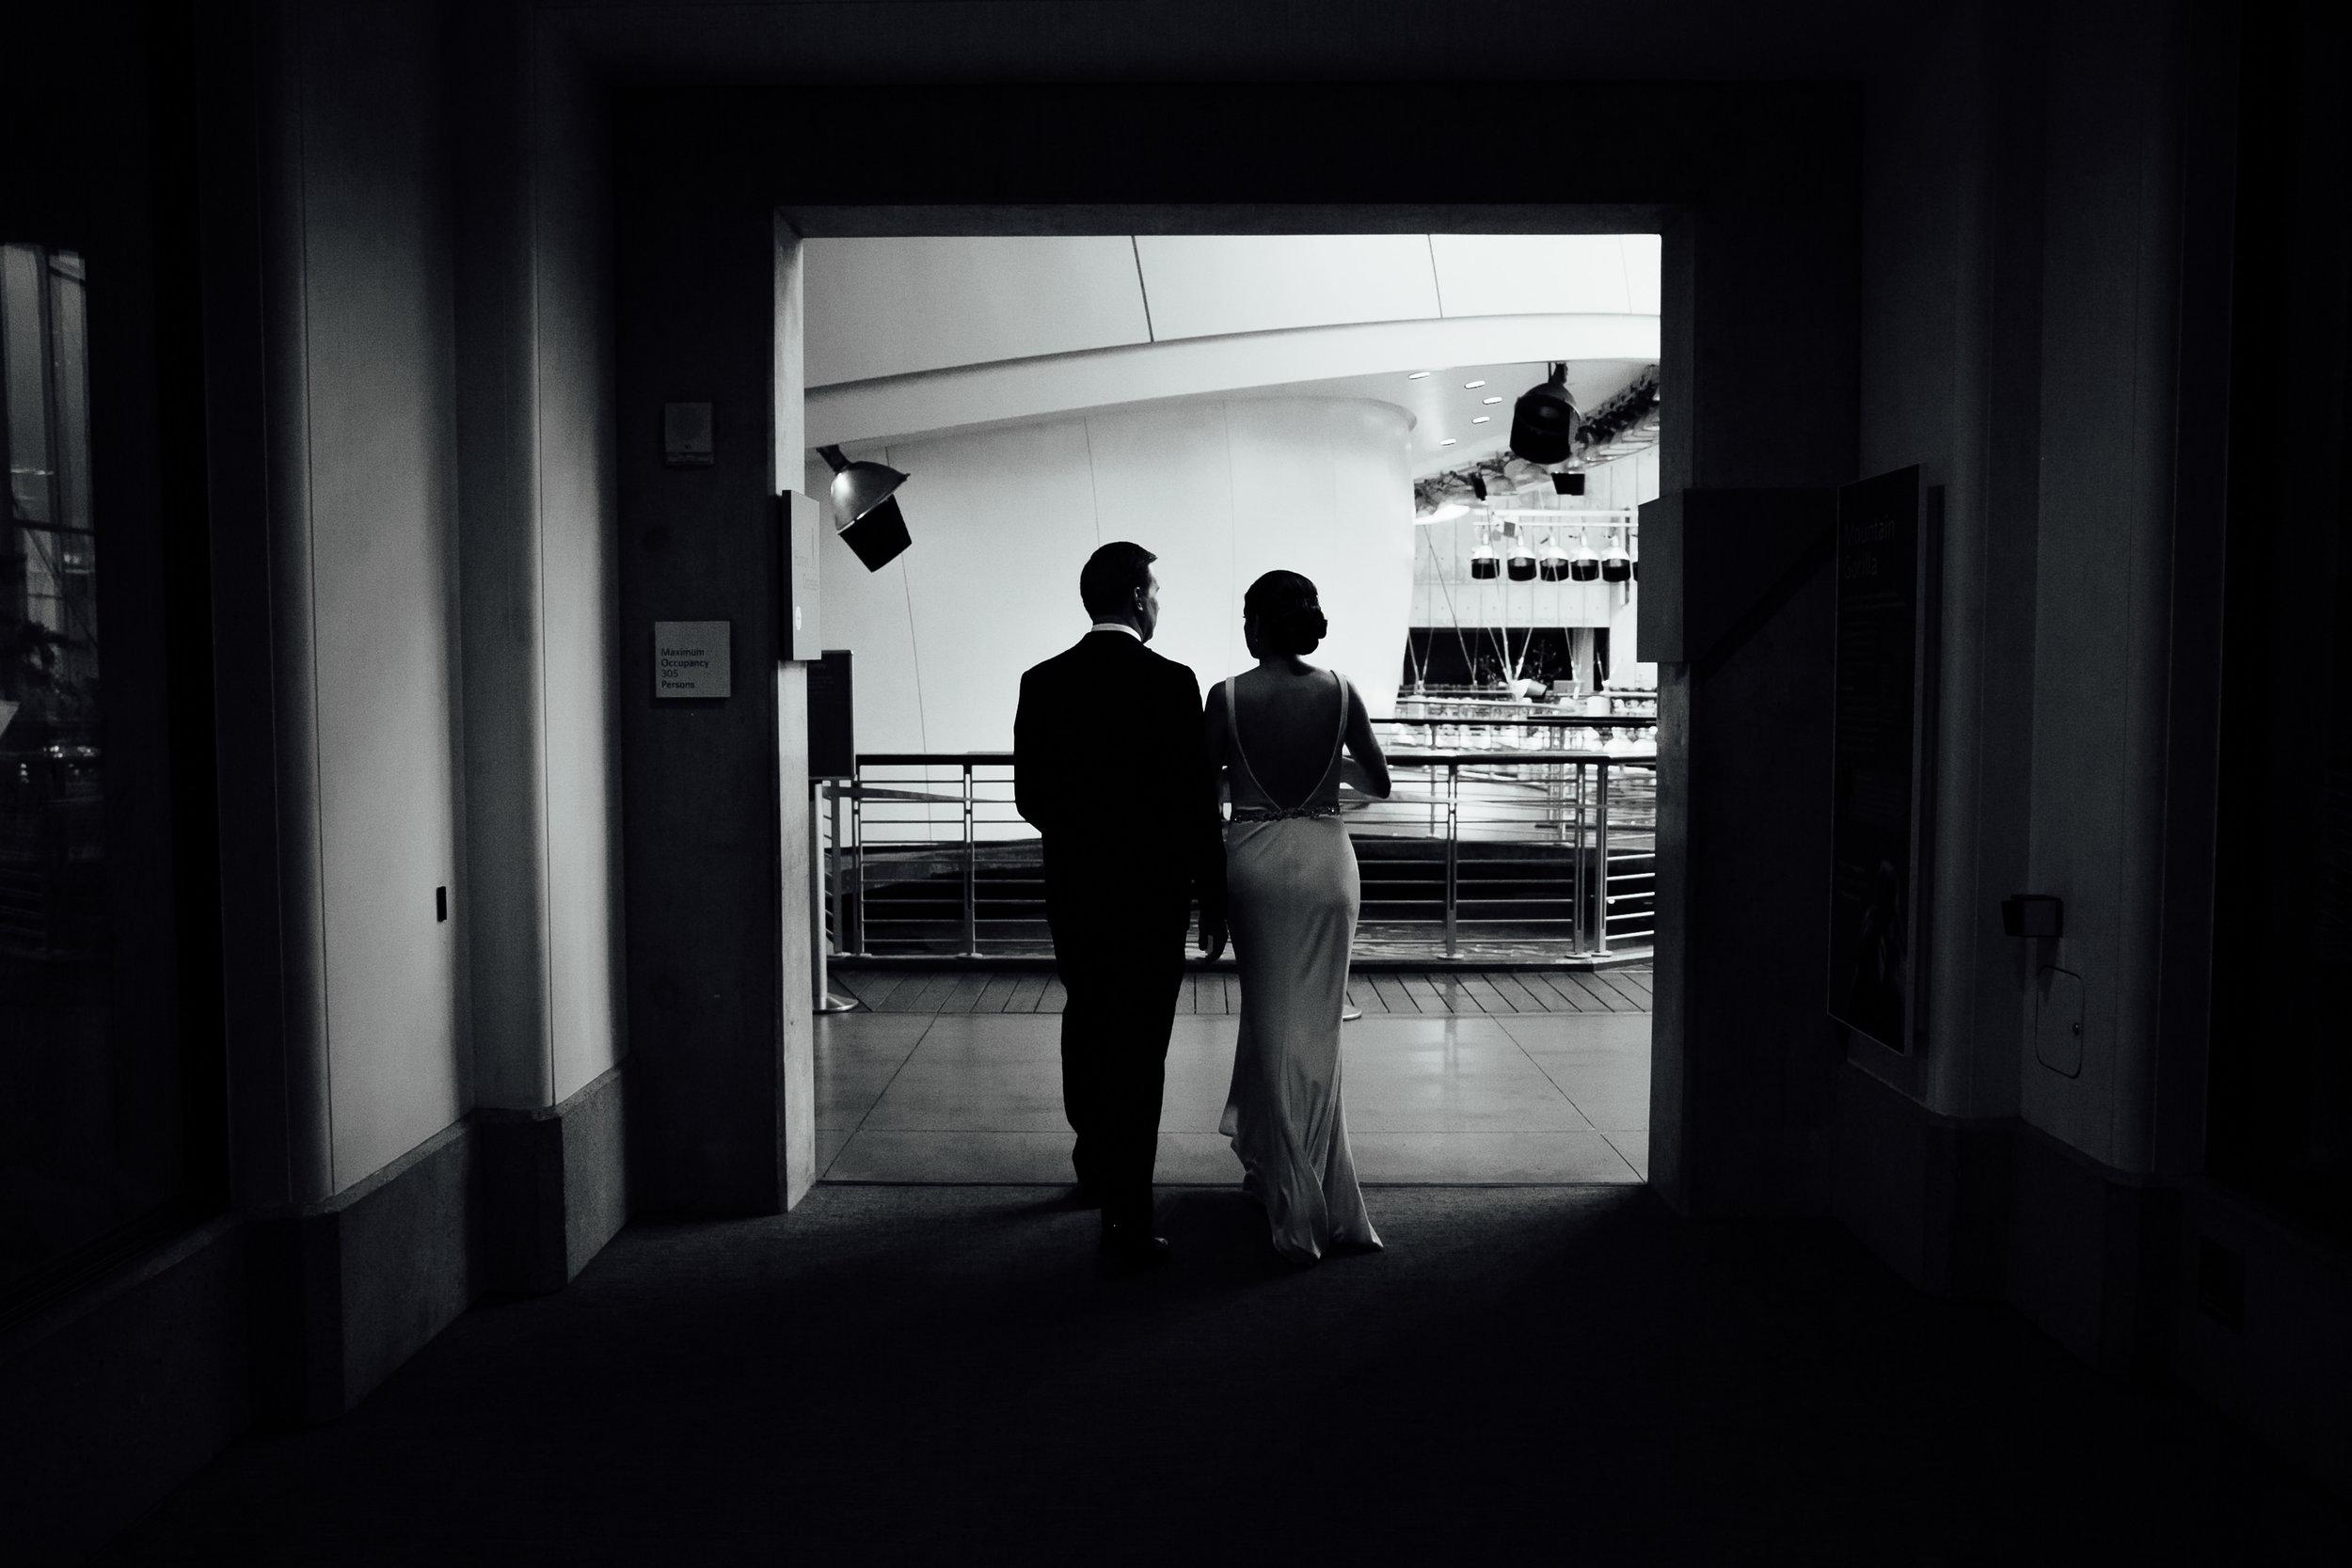 Wedding_KathleenMichael_Ceremony-221.jpg